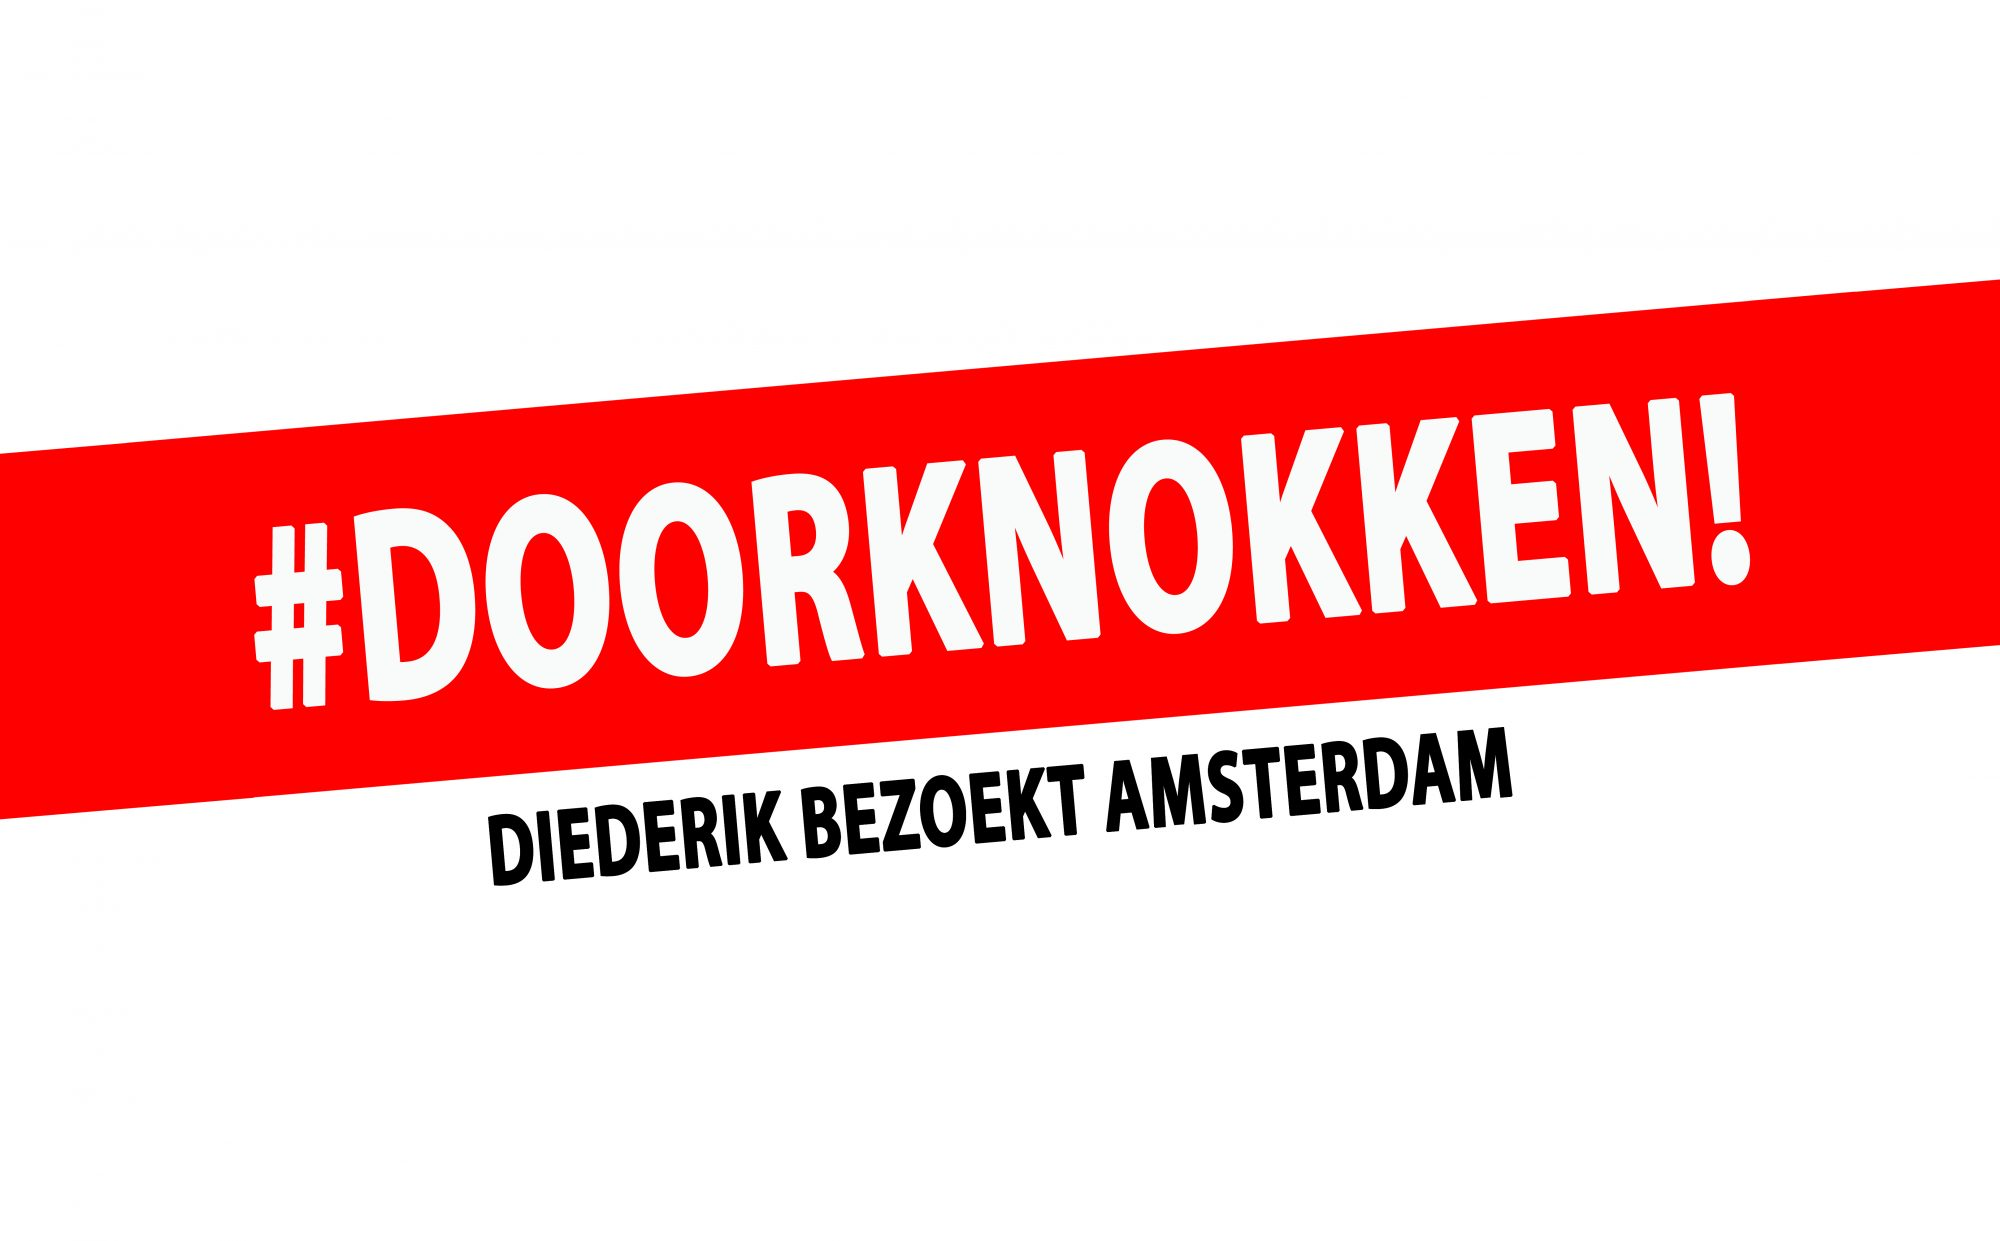 Bezoek van Diederik Samsom - PvdA Amsterdam